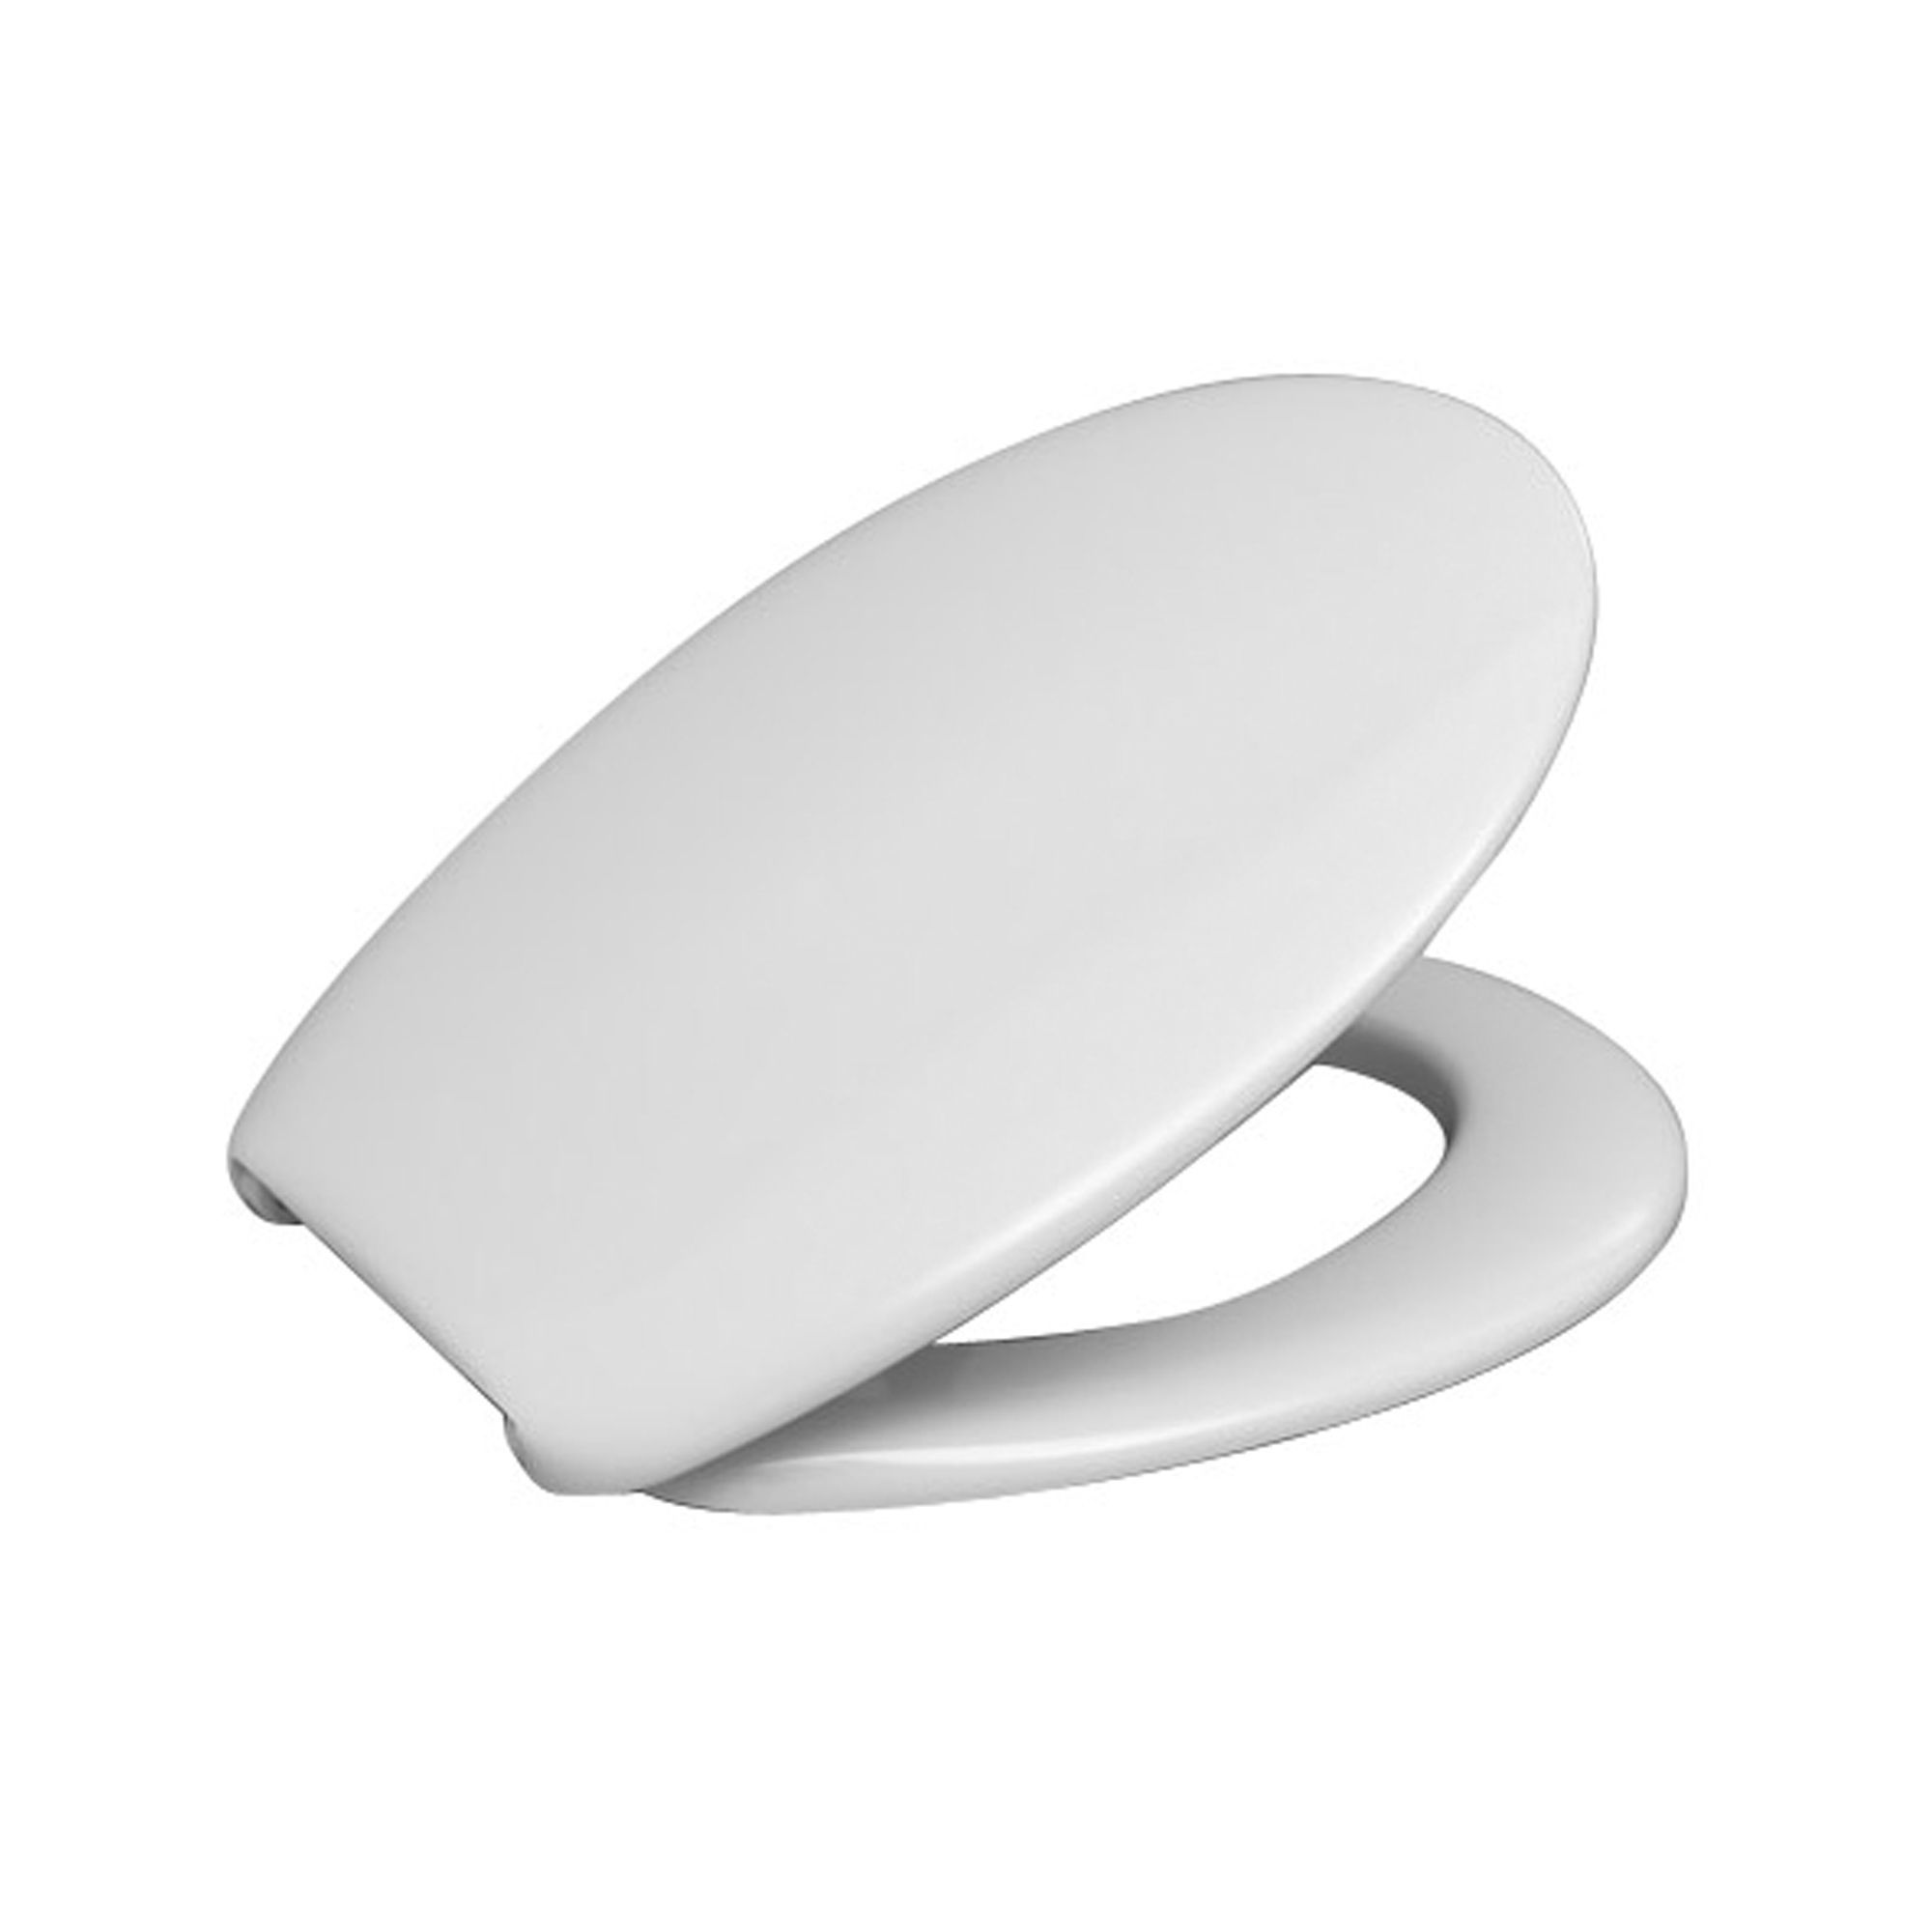 Marvelous Cedo Poplar White Toilet Seat Departments Diy At Bq Creativecarmelina Interior Chair Design Creativecarmelinacom